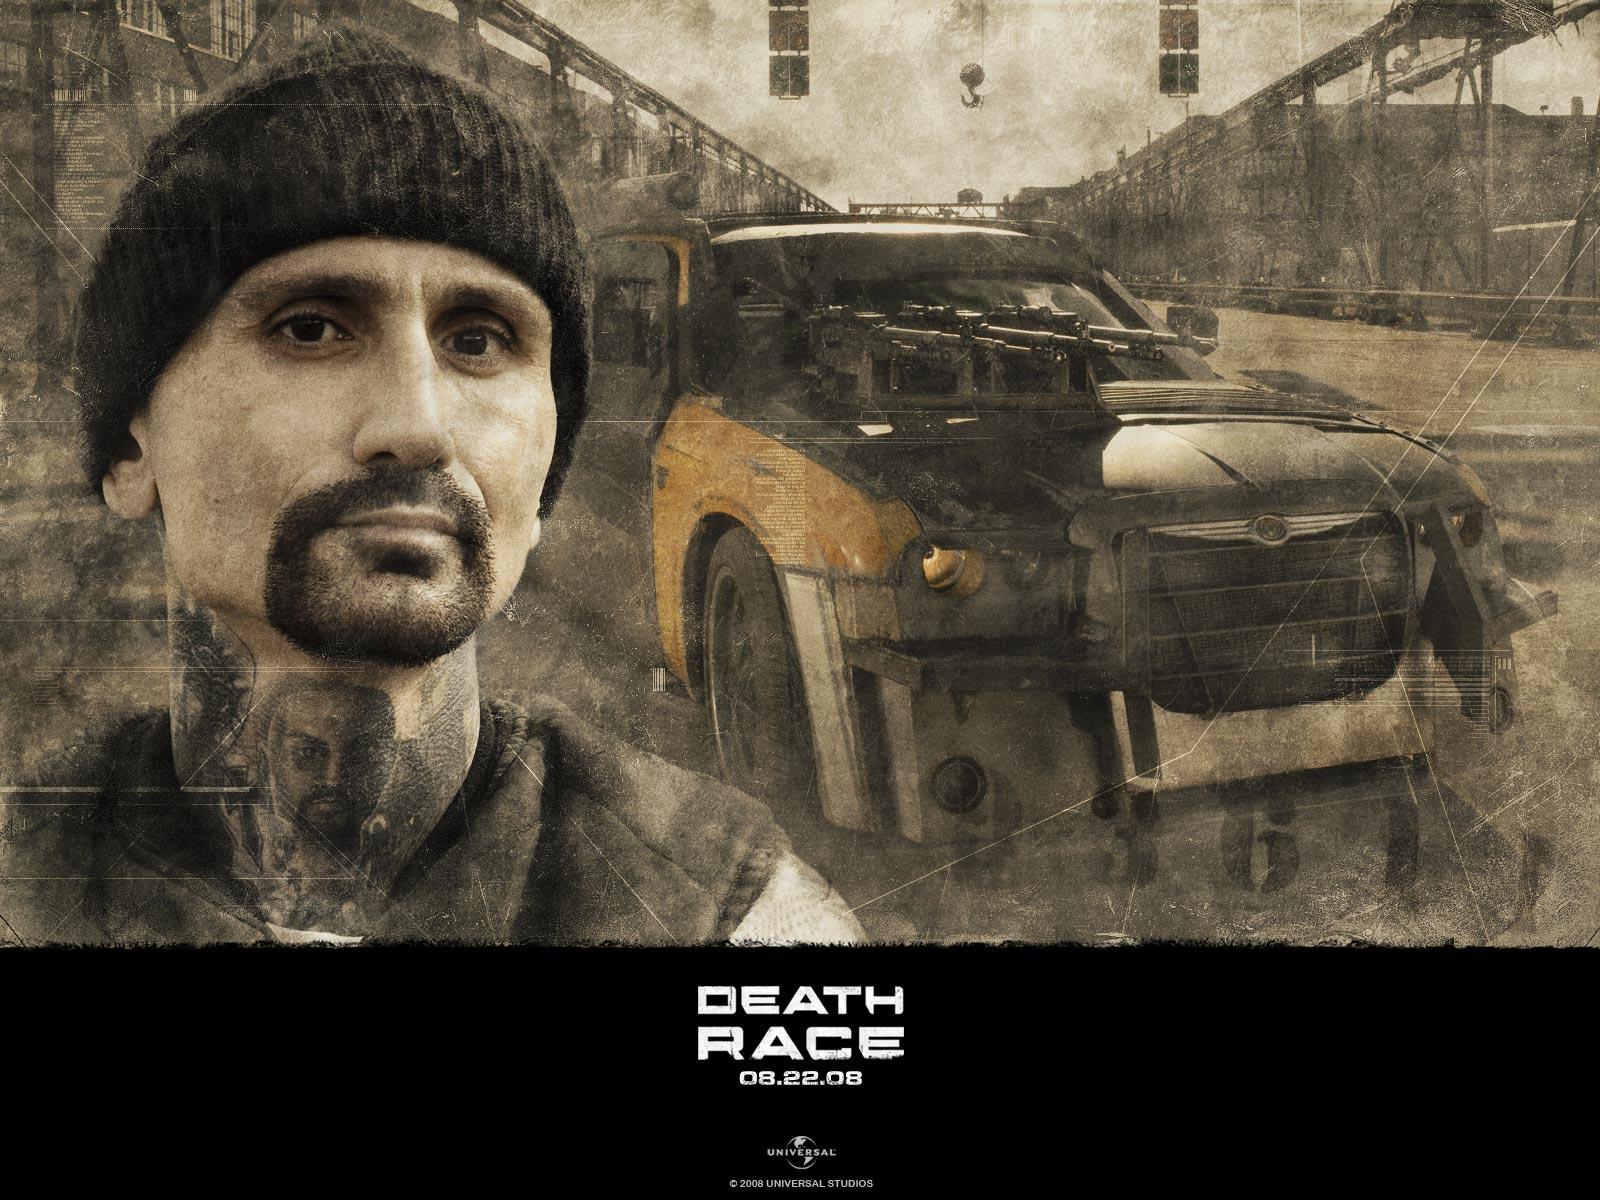 The Lighted Death Race 2008